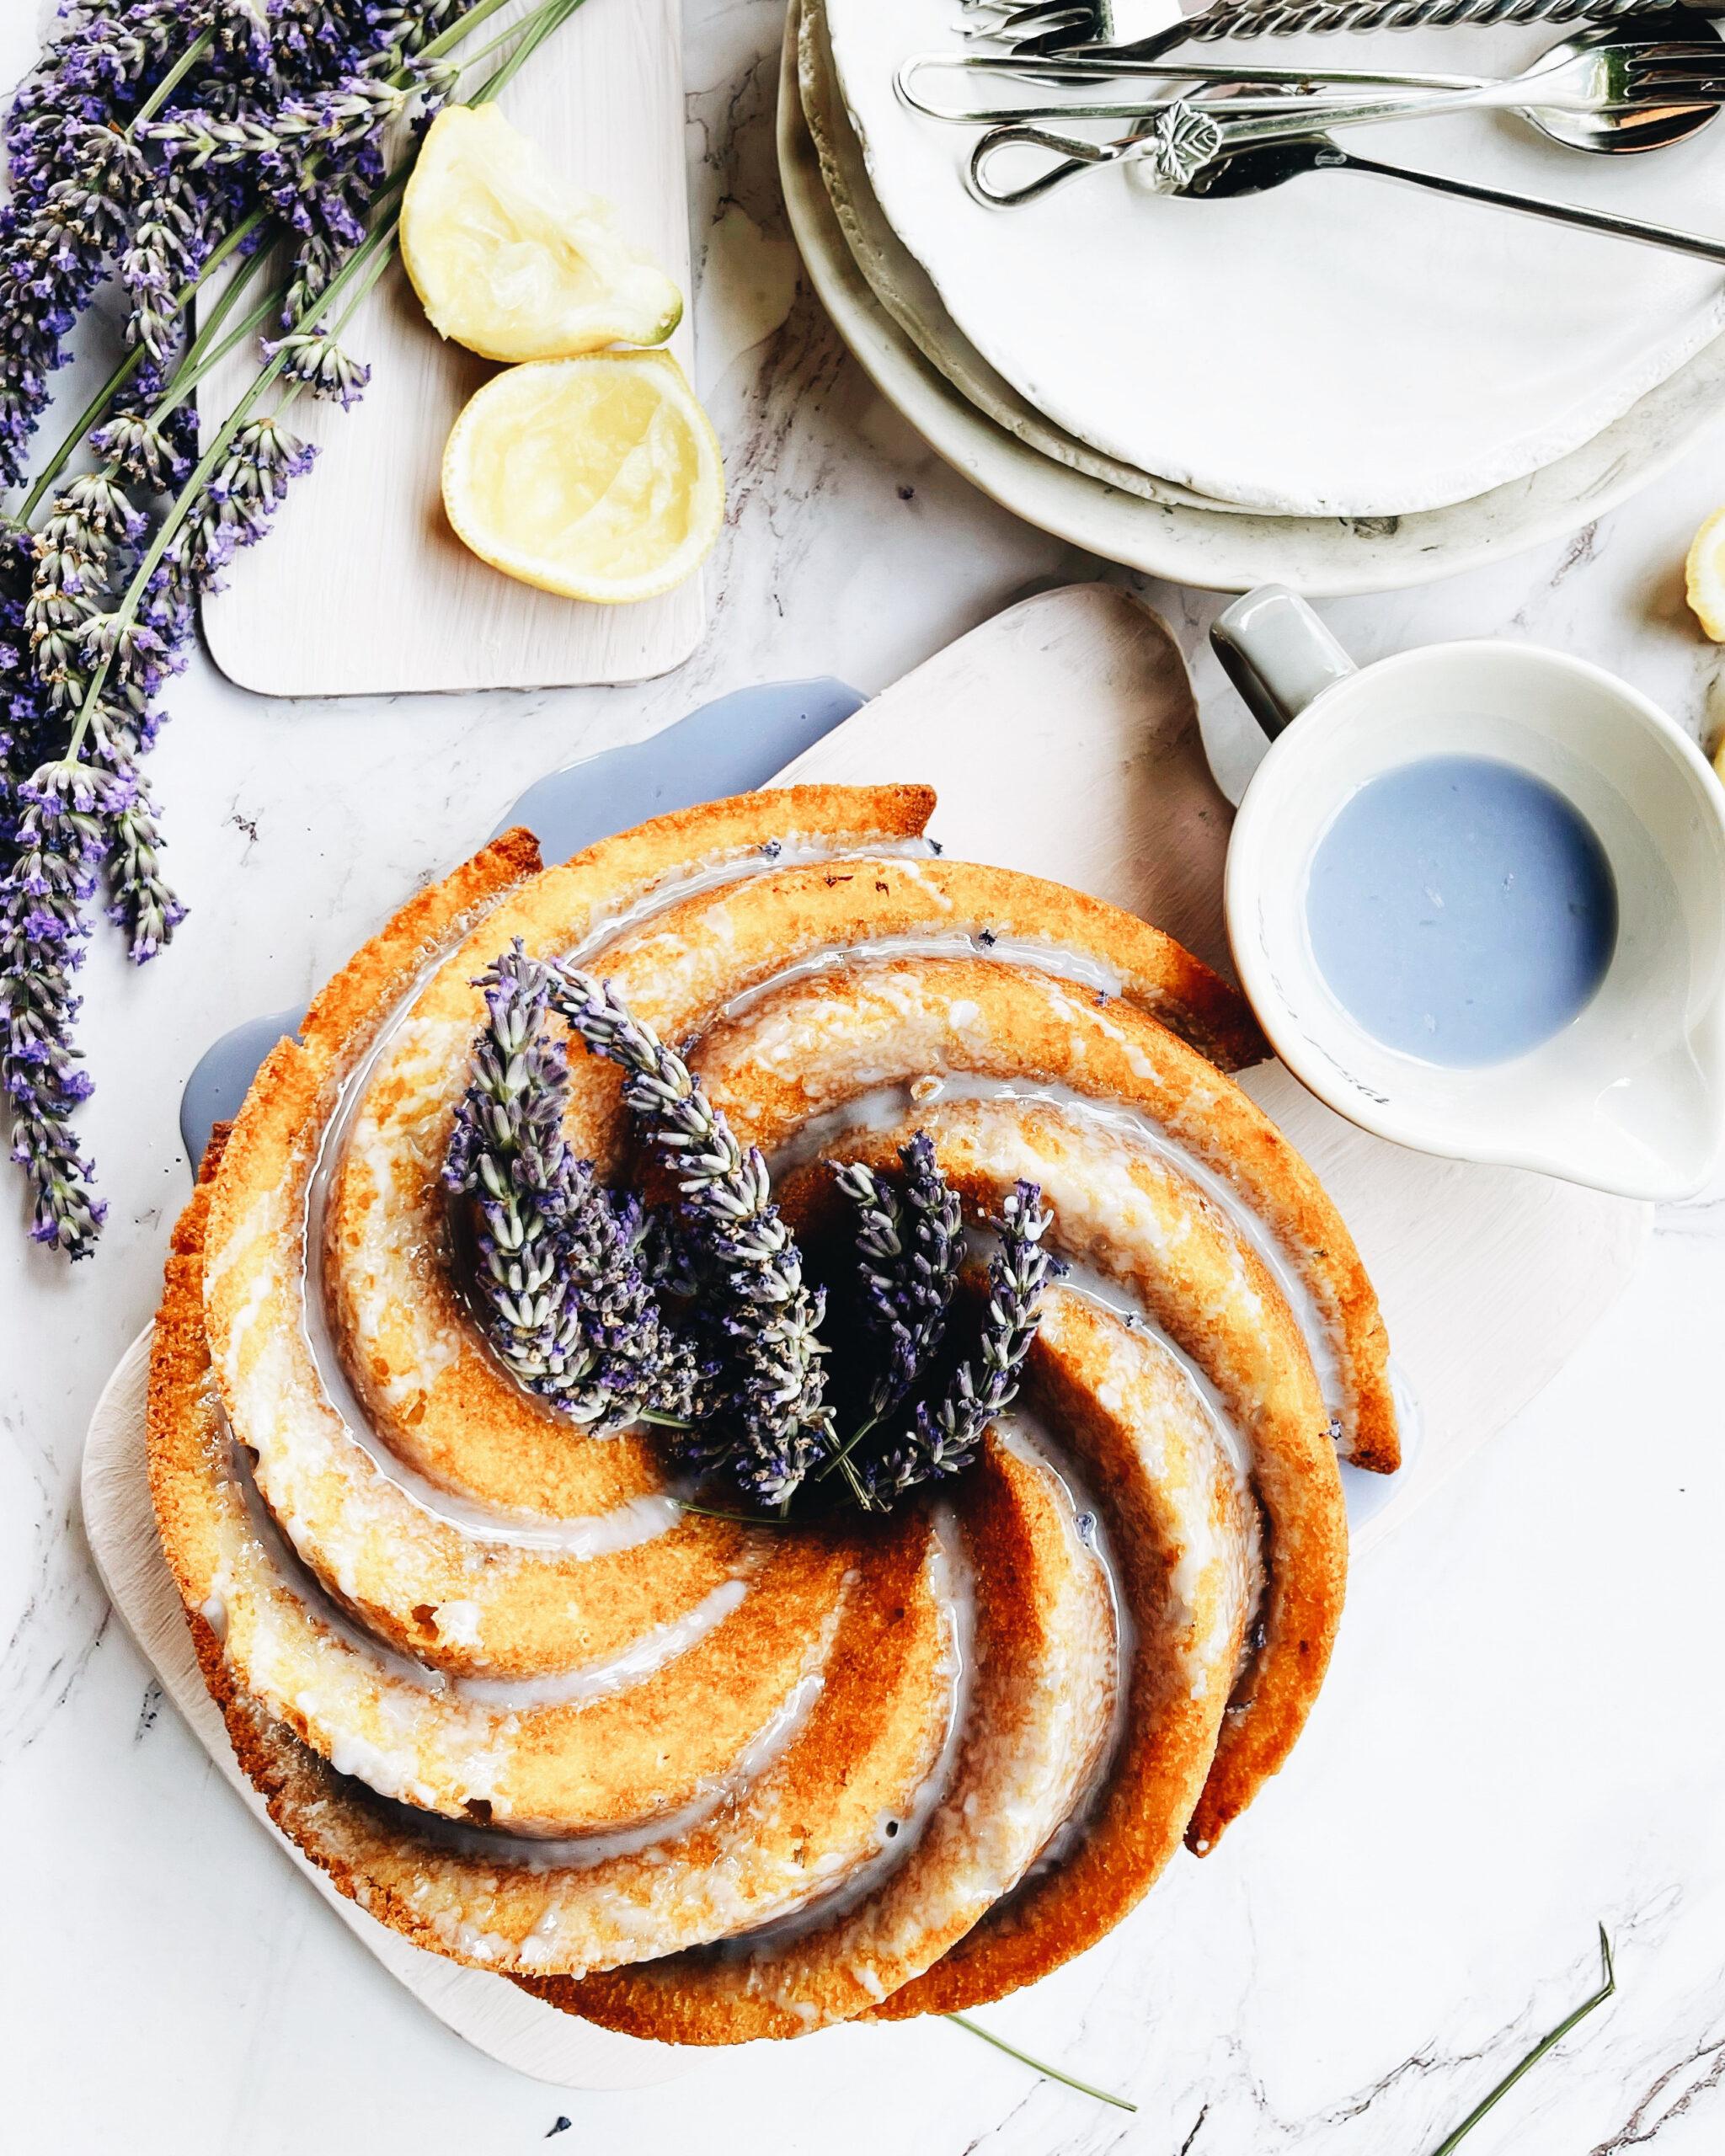 Lavender-lemon bundt cake